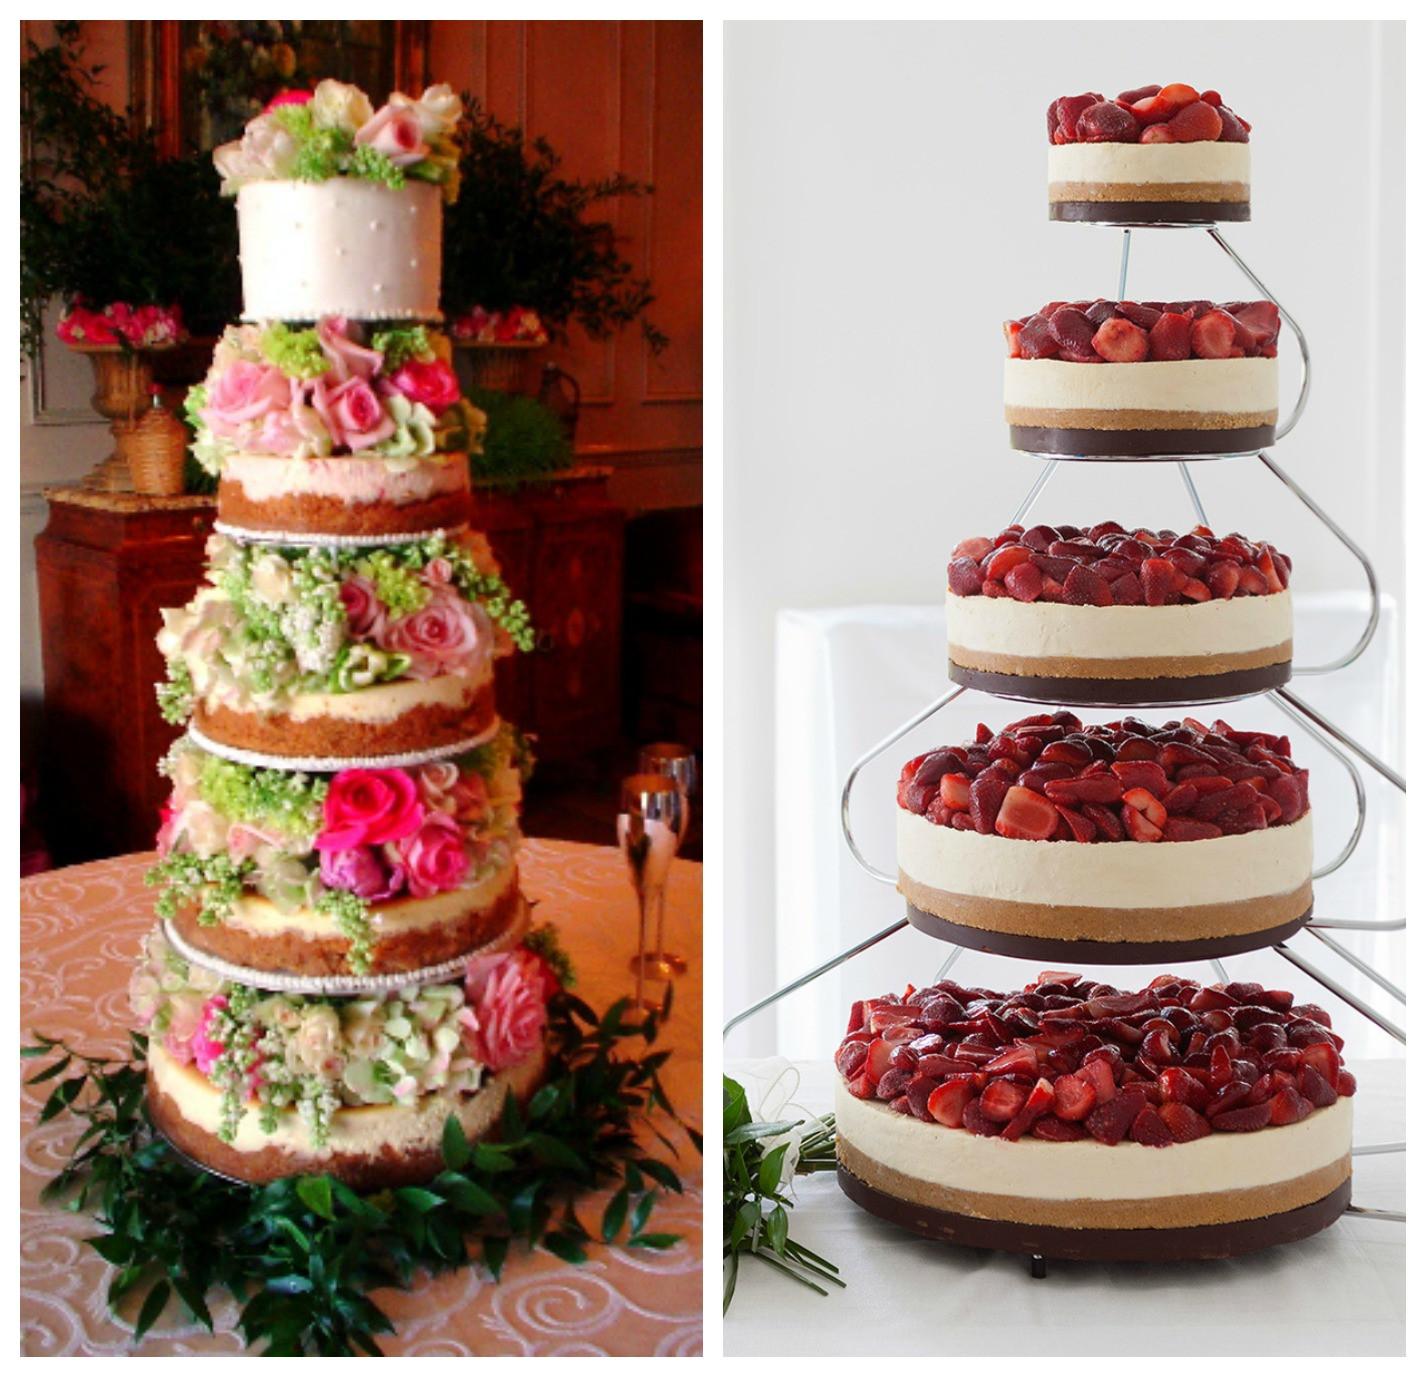 Cheesecake Wedding Cakes  Tea & Doilies